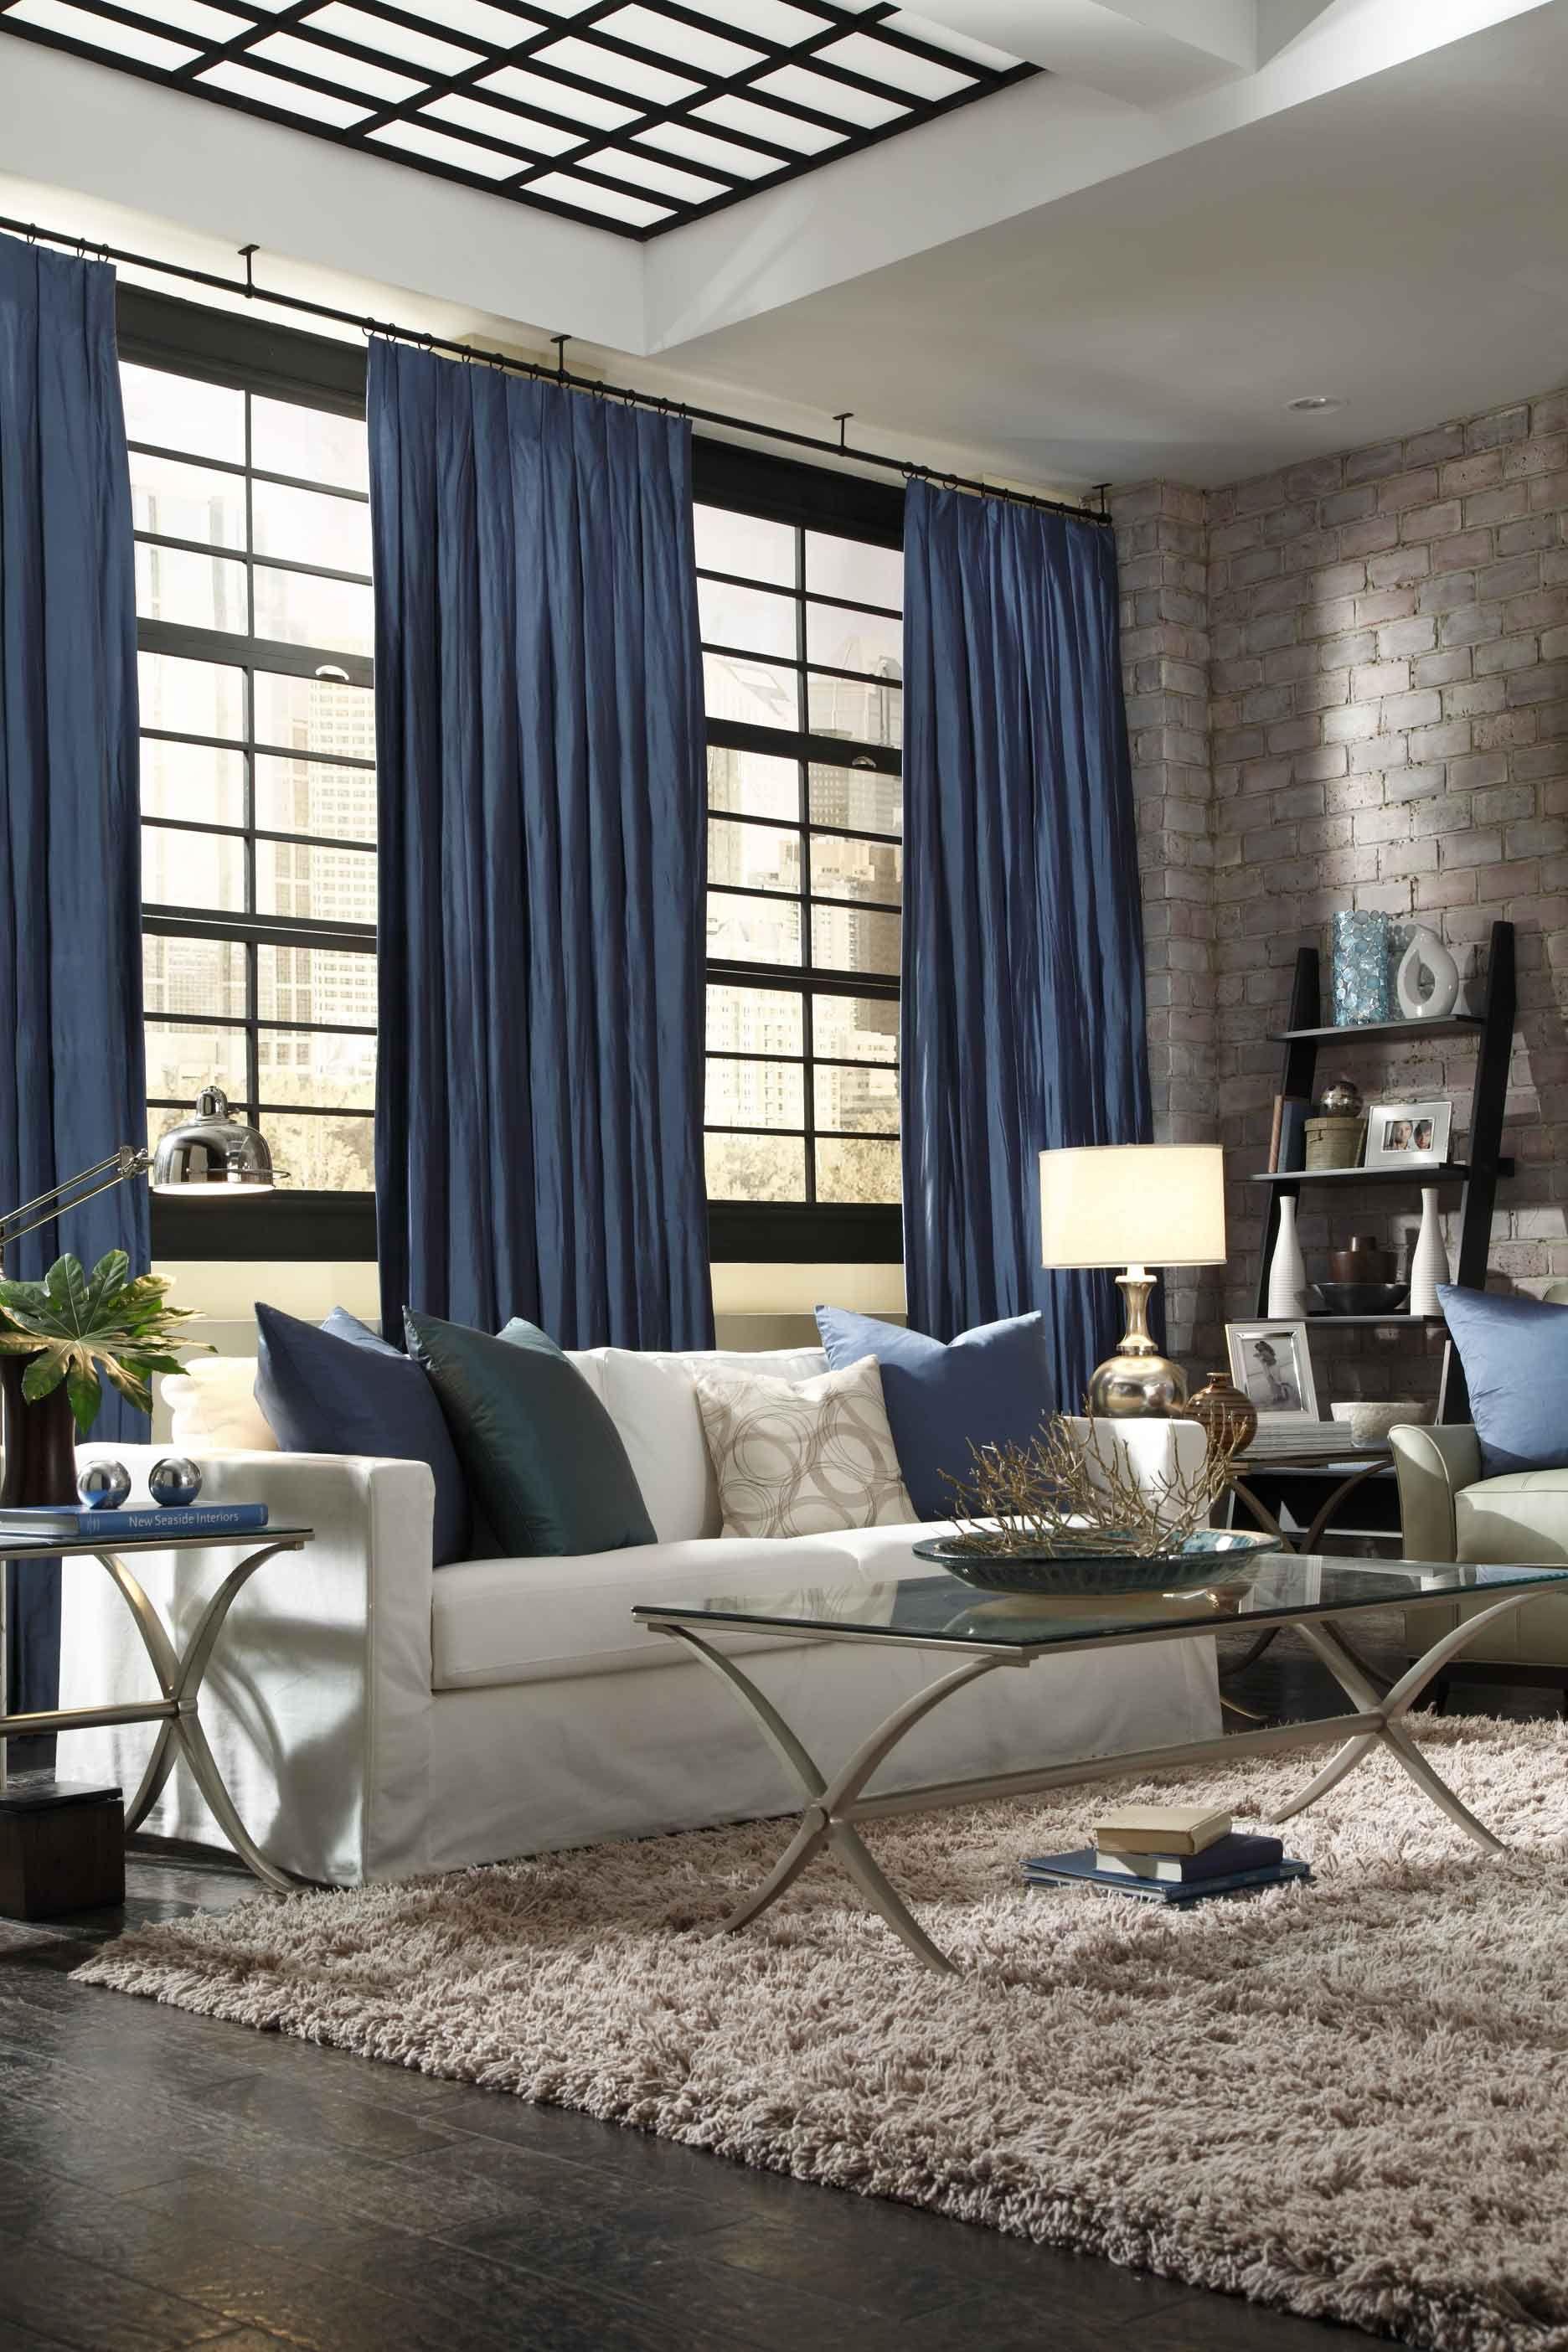 Stunning Home Decor With Blue Curtains Http Blog Eddiezs Com Tag